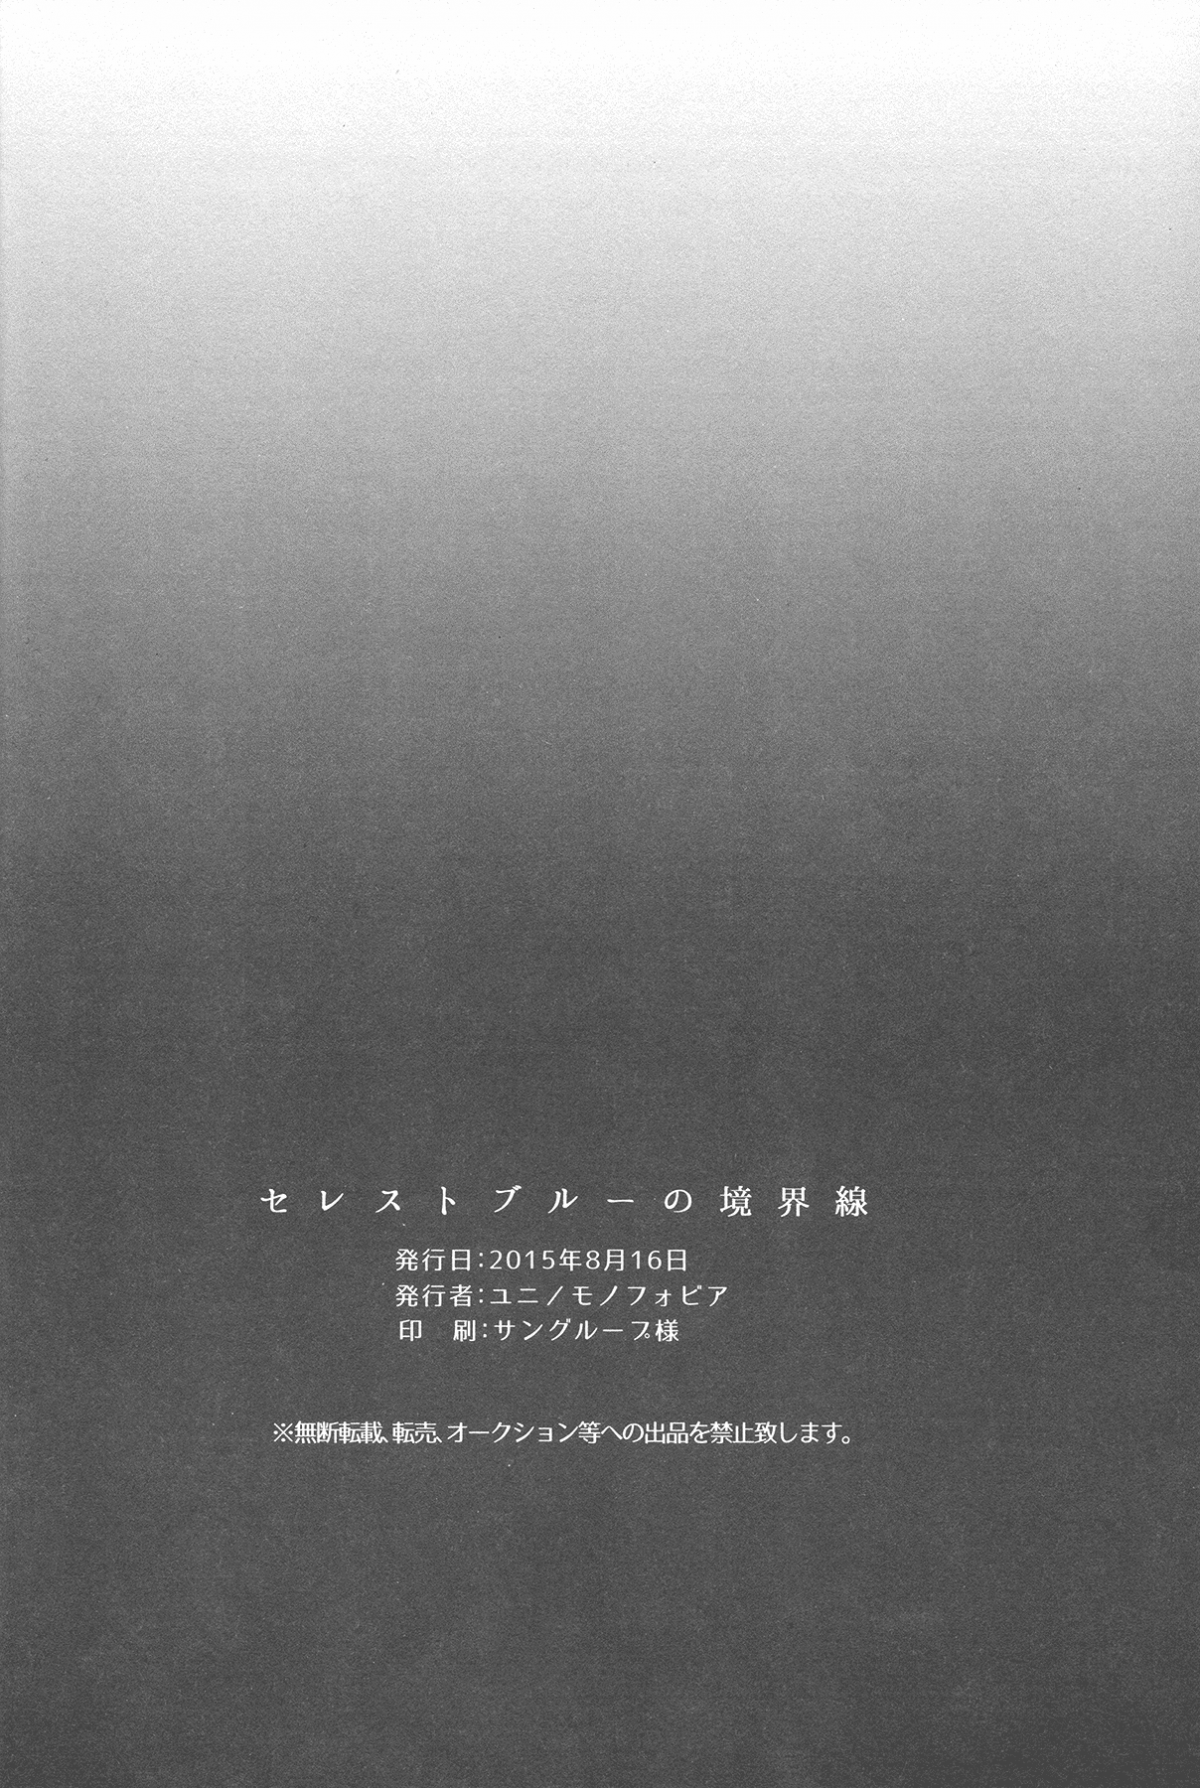 Hình ảnh  trong bài viết Celeste Blue no Kyoukaisen